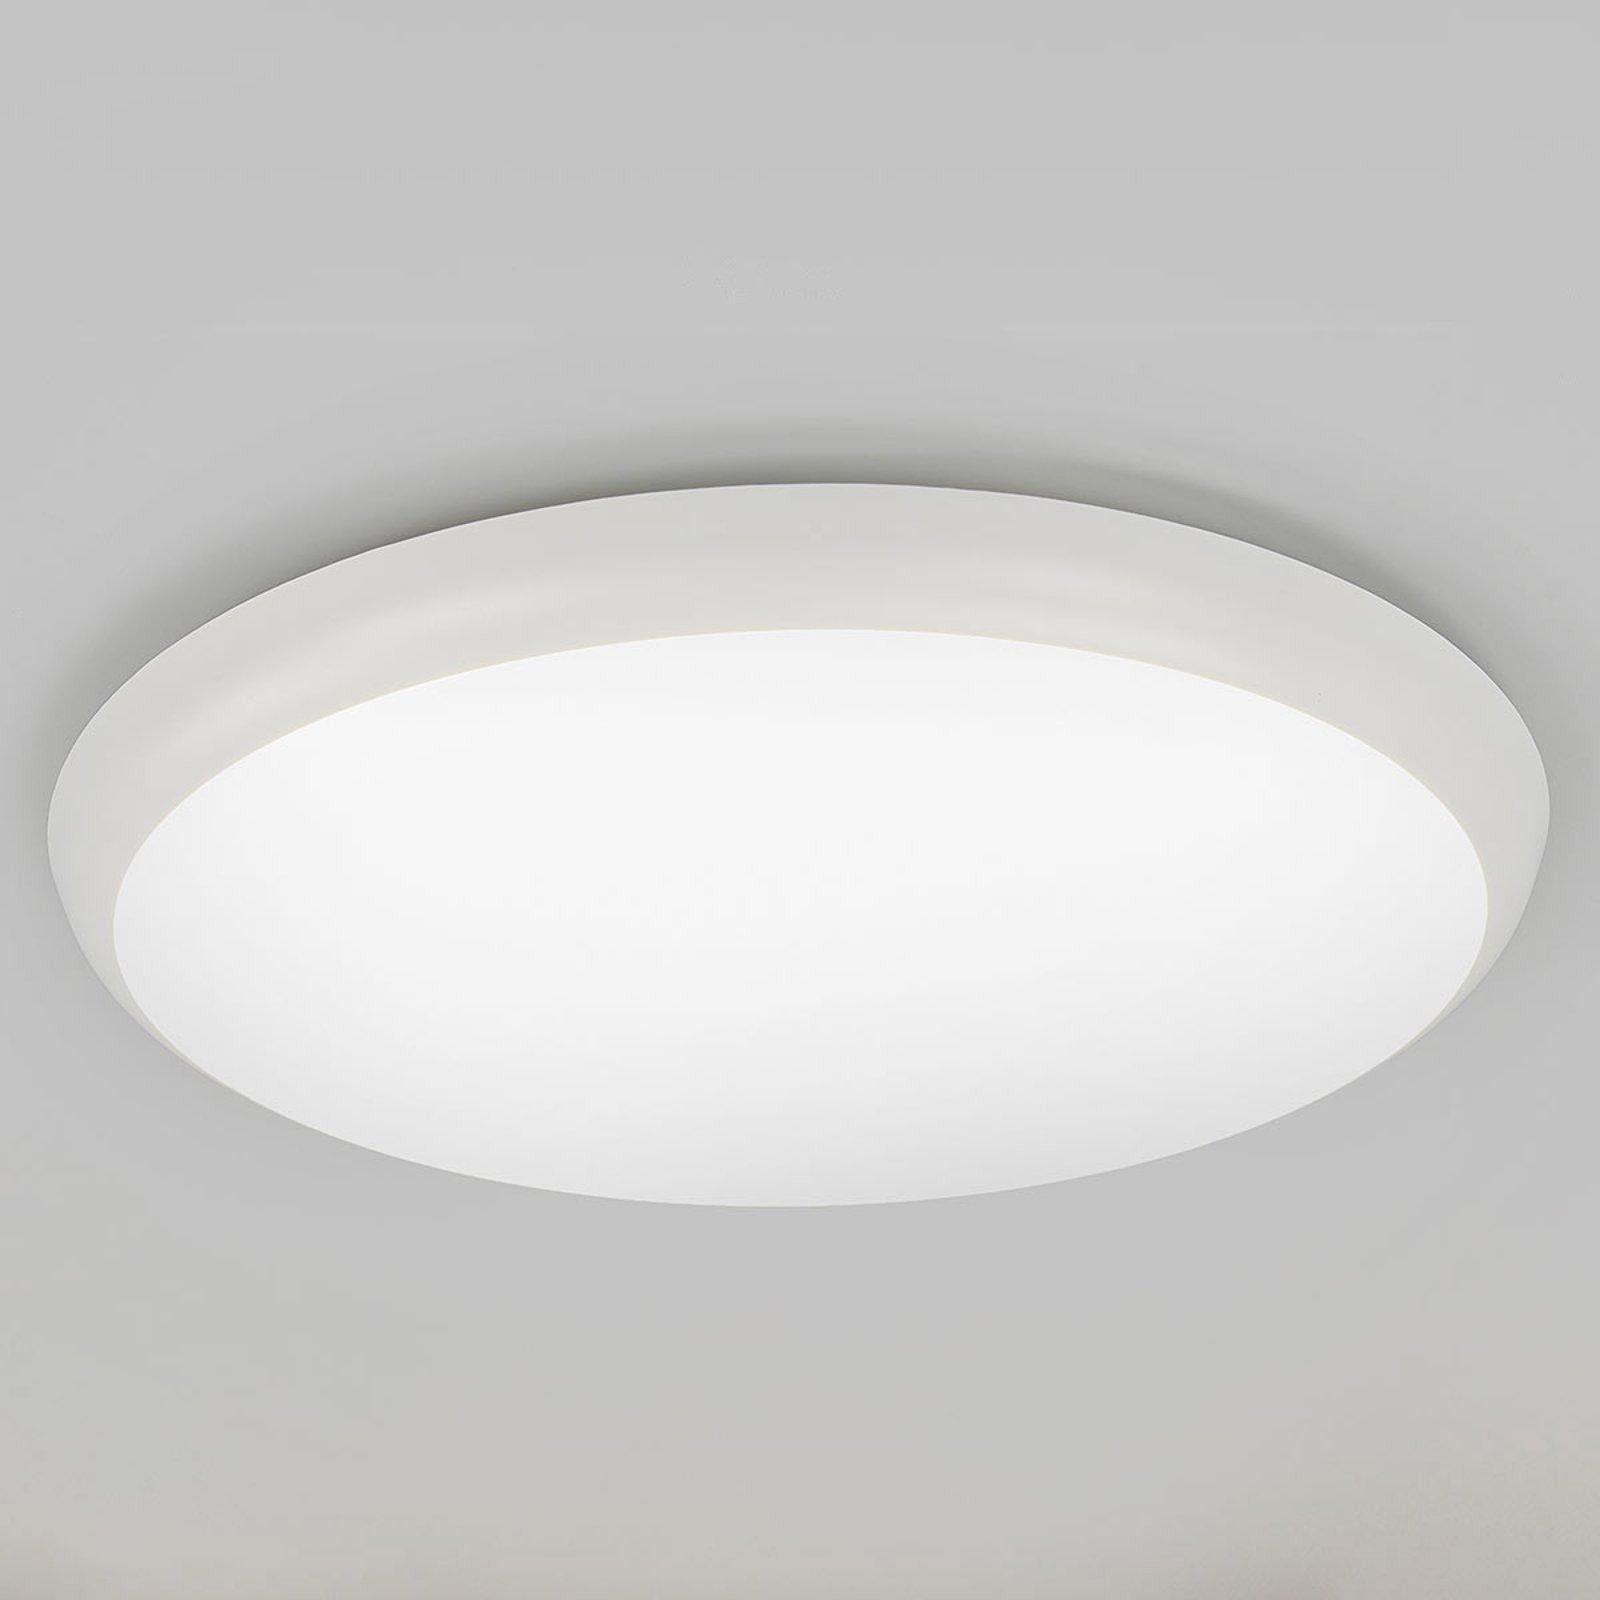 Augustin - LED-taklampe med rund form, 40 cm